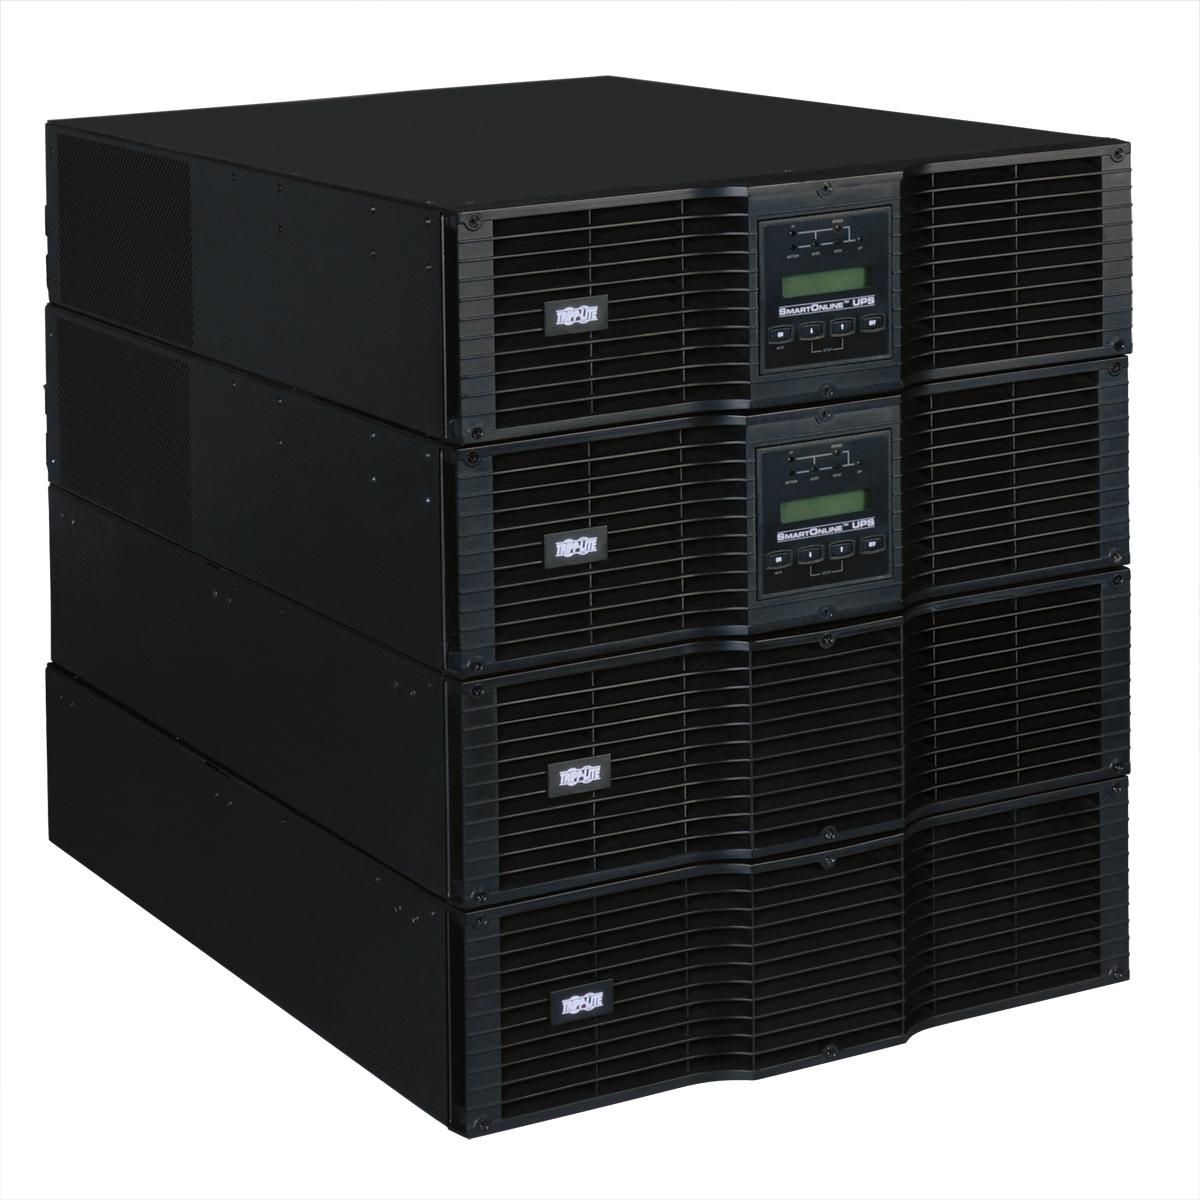 Tripp Lite SmartOnline 200-240V 16kVA 14.4kW Double-Conversion UPS, N+1, 12U, Network Card Slot, USB, DB9, Bypass Switch, C19